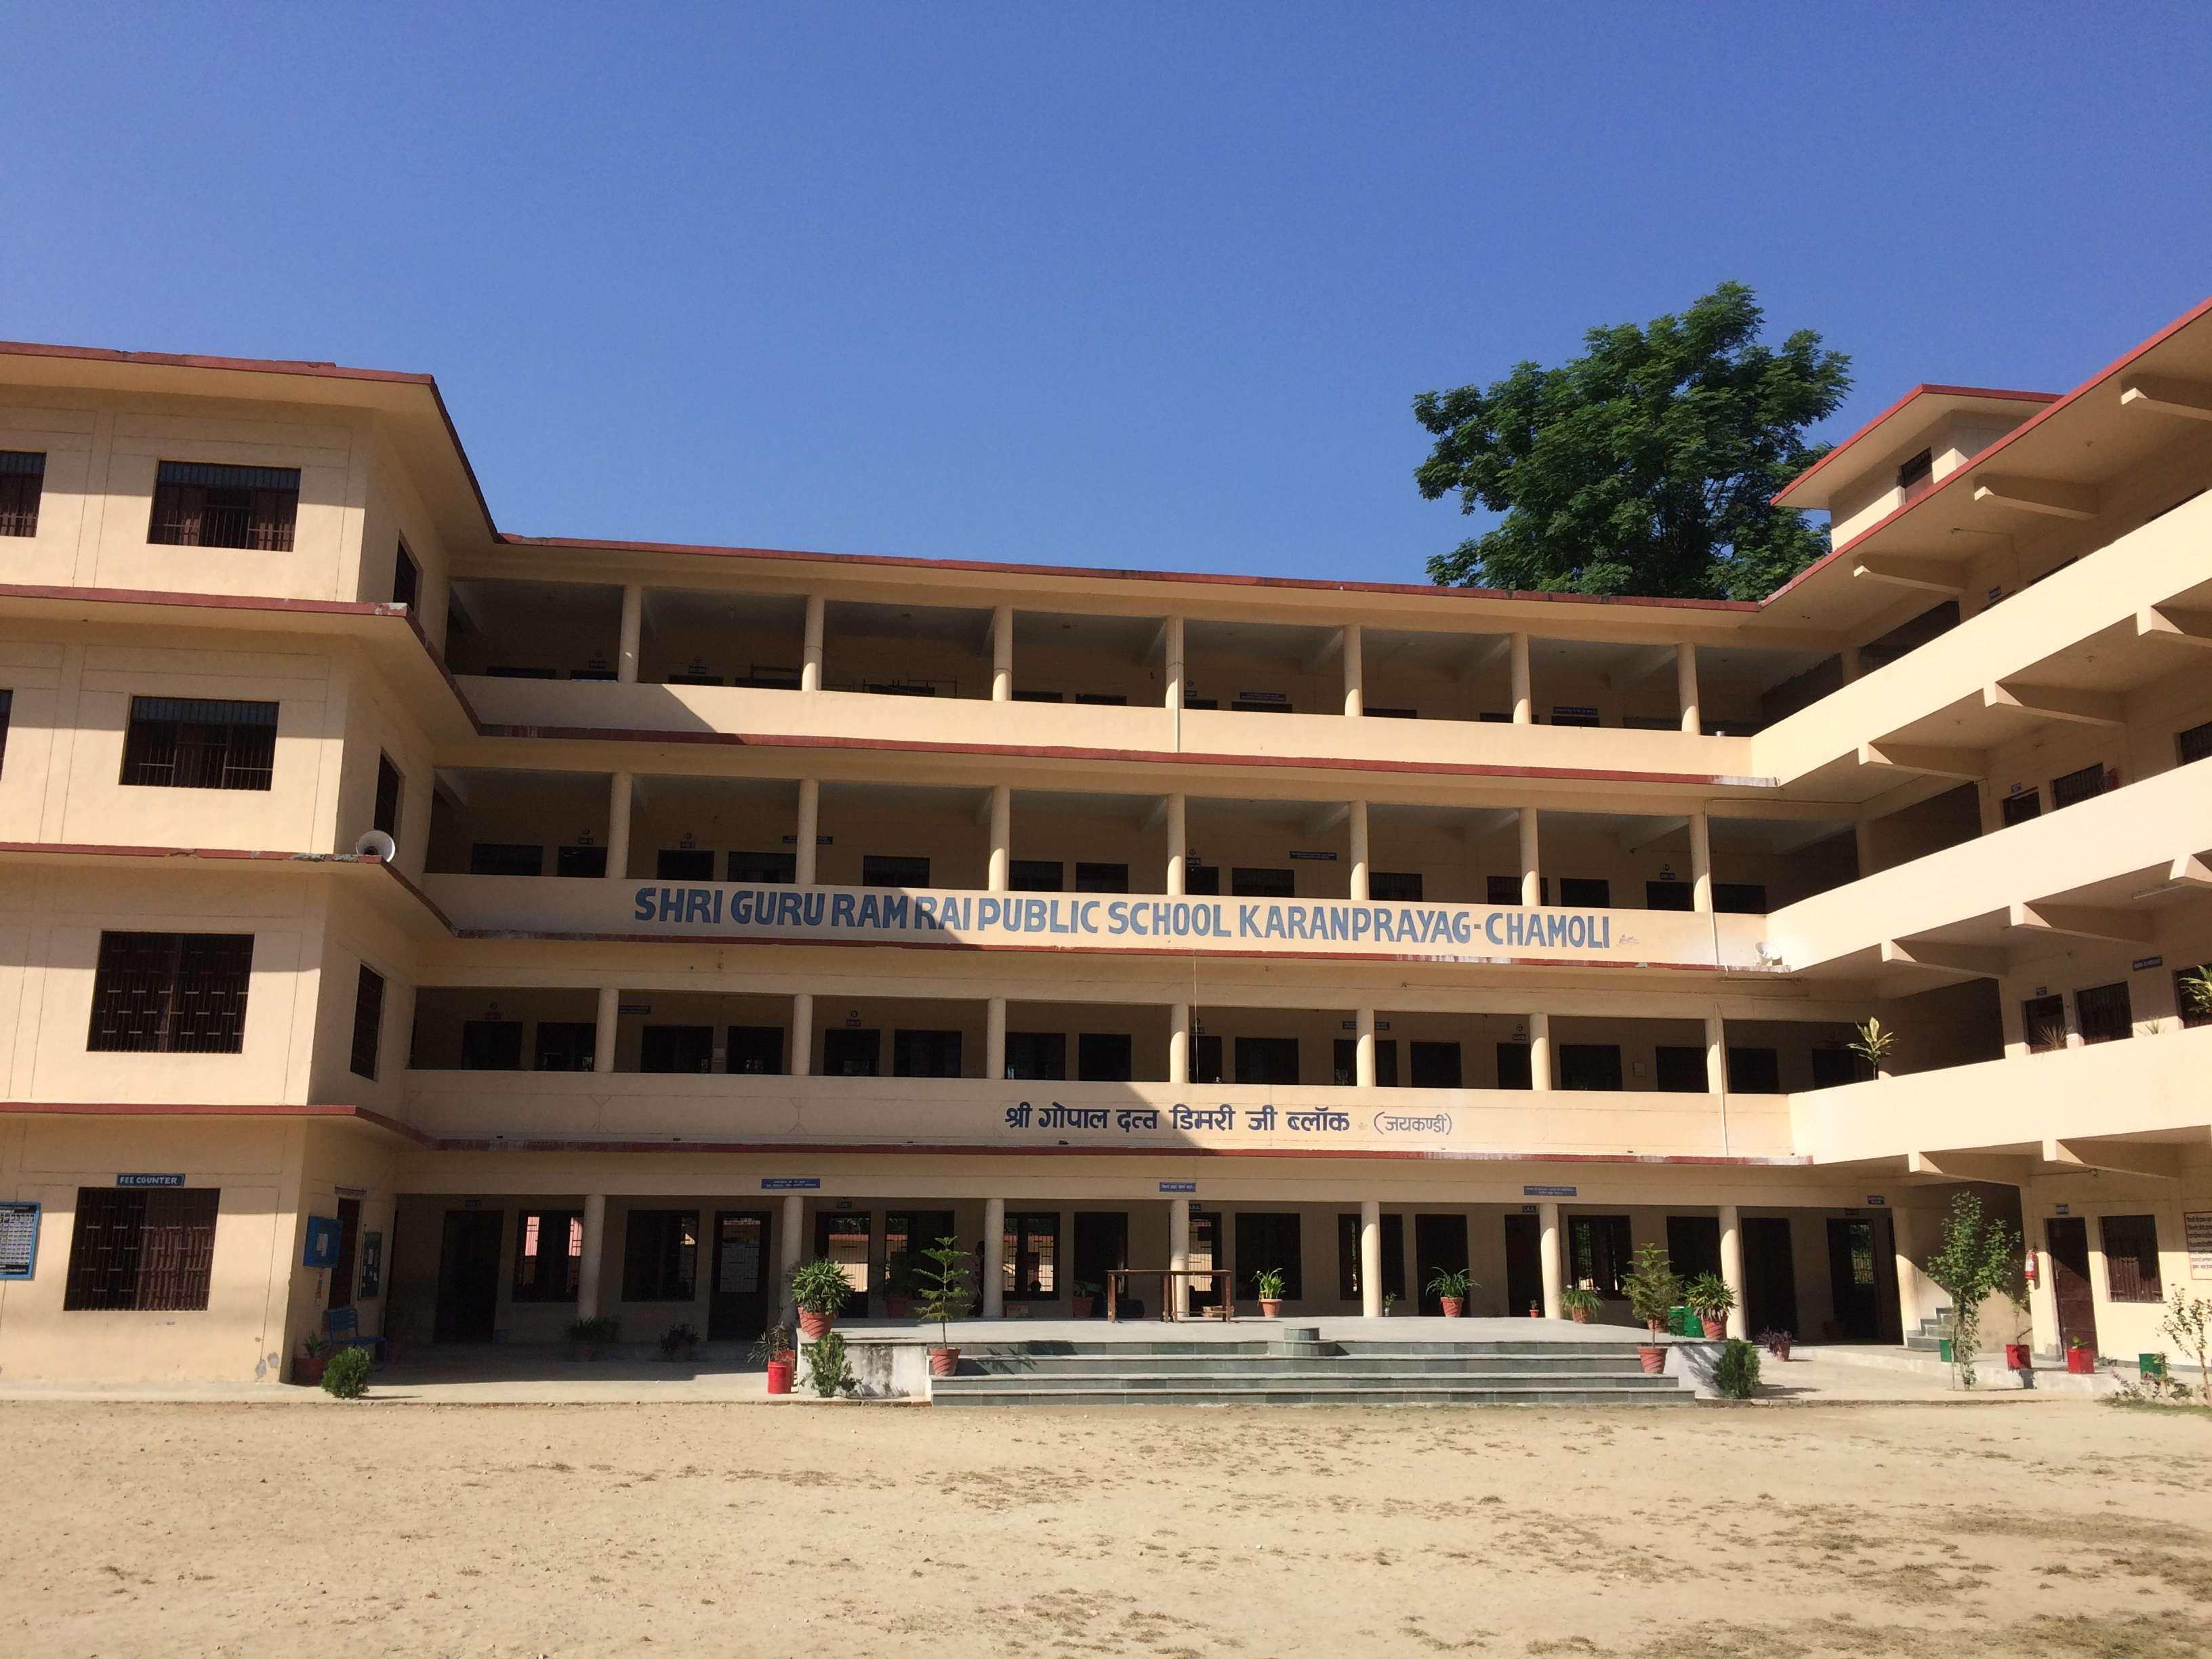 SHRI GURU RAM RAI PUBLIC SCHOOL KARANPRAYAG CHAMOLI GARHWAL P O LANGASU KARANPRAYAG CHAMOLI 3530262